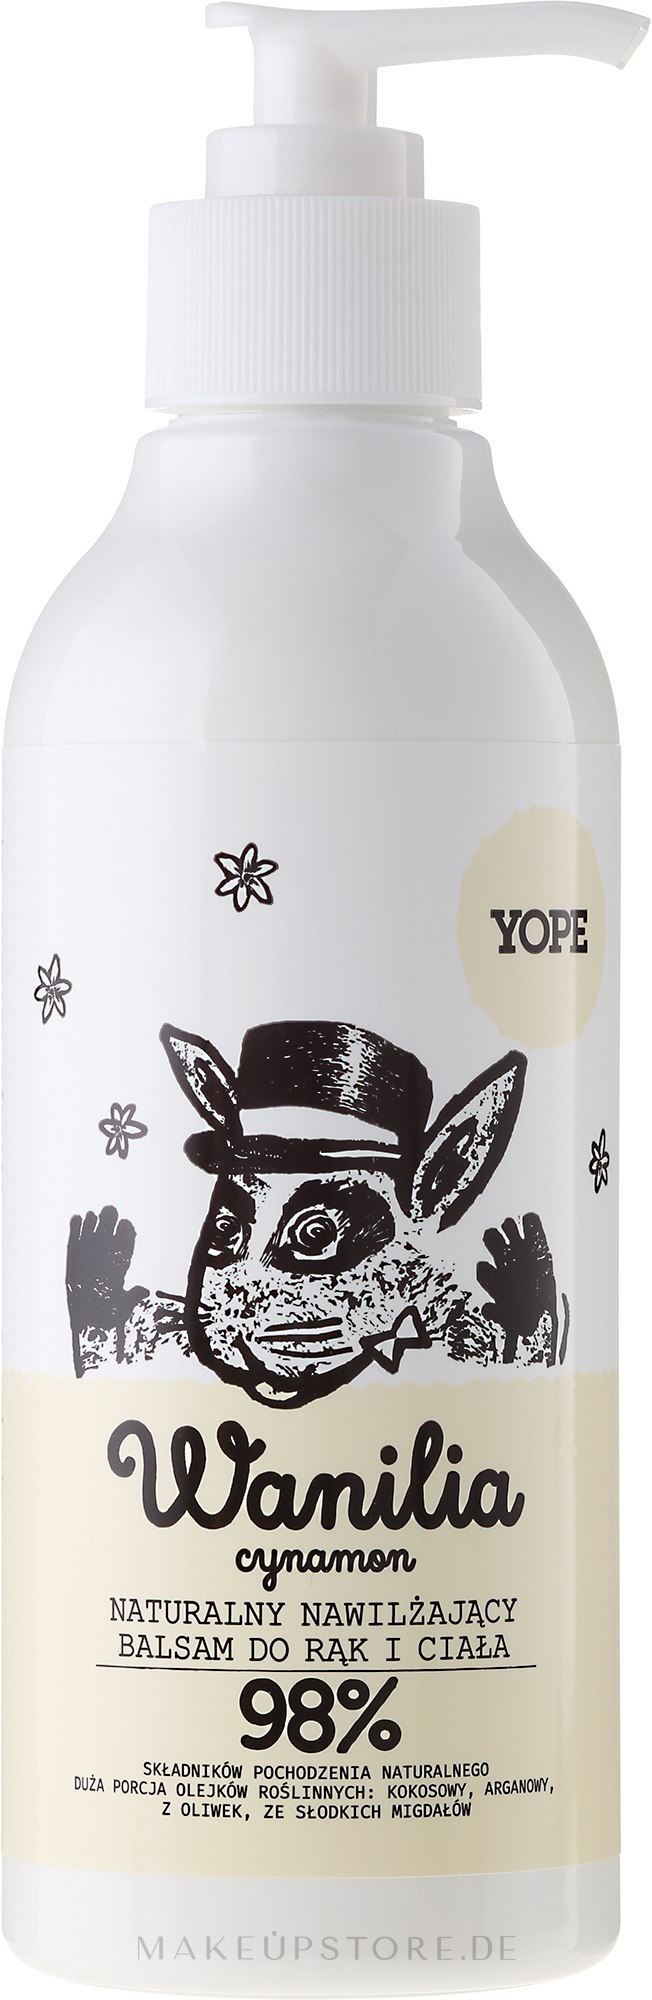 Nährende Hand- und Körperlotion für trockene Haut - Yope Vanilla & Cinnamon Hand And Body Lotion — Bild 300 ml